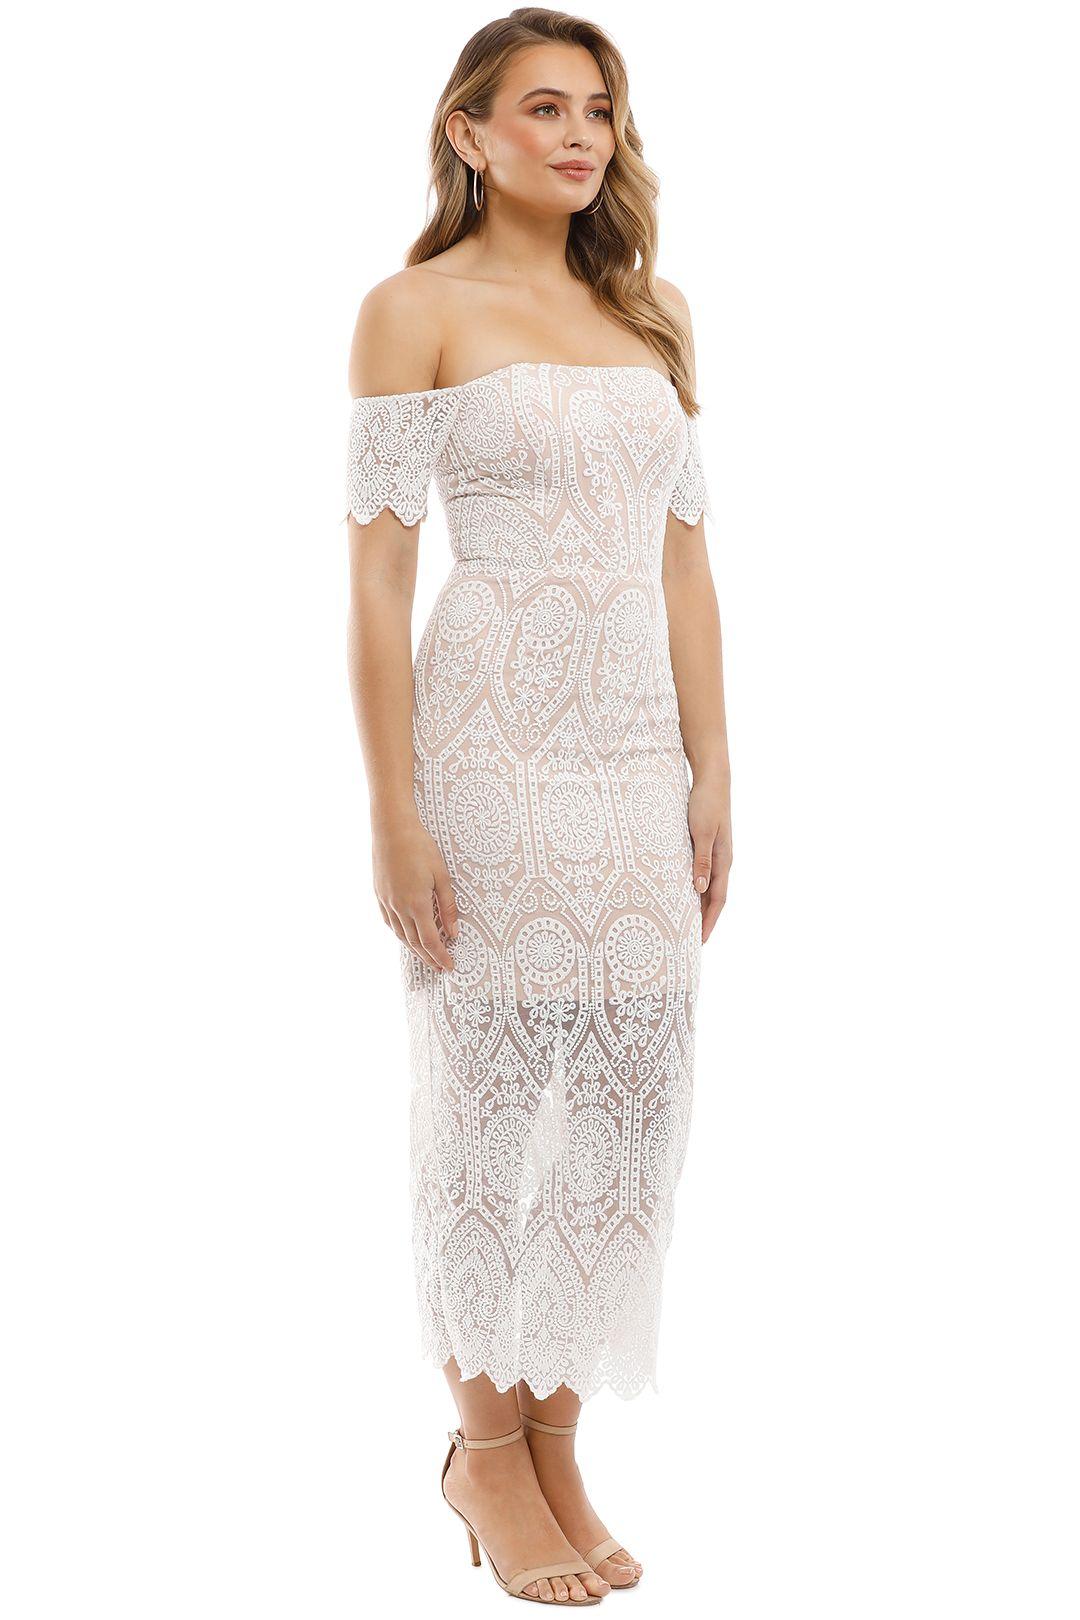 Elle Zeitoune - Emmanuelle Dress - White - Side